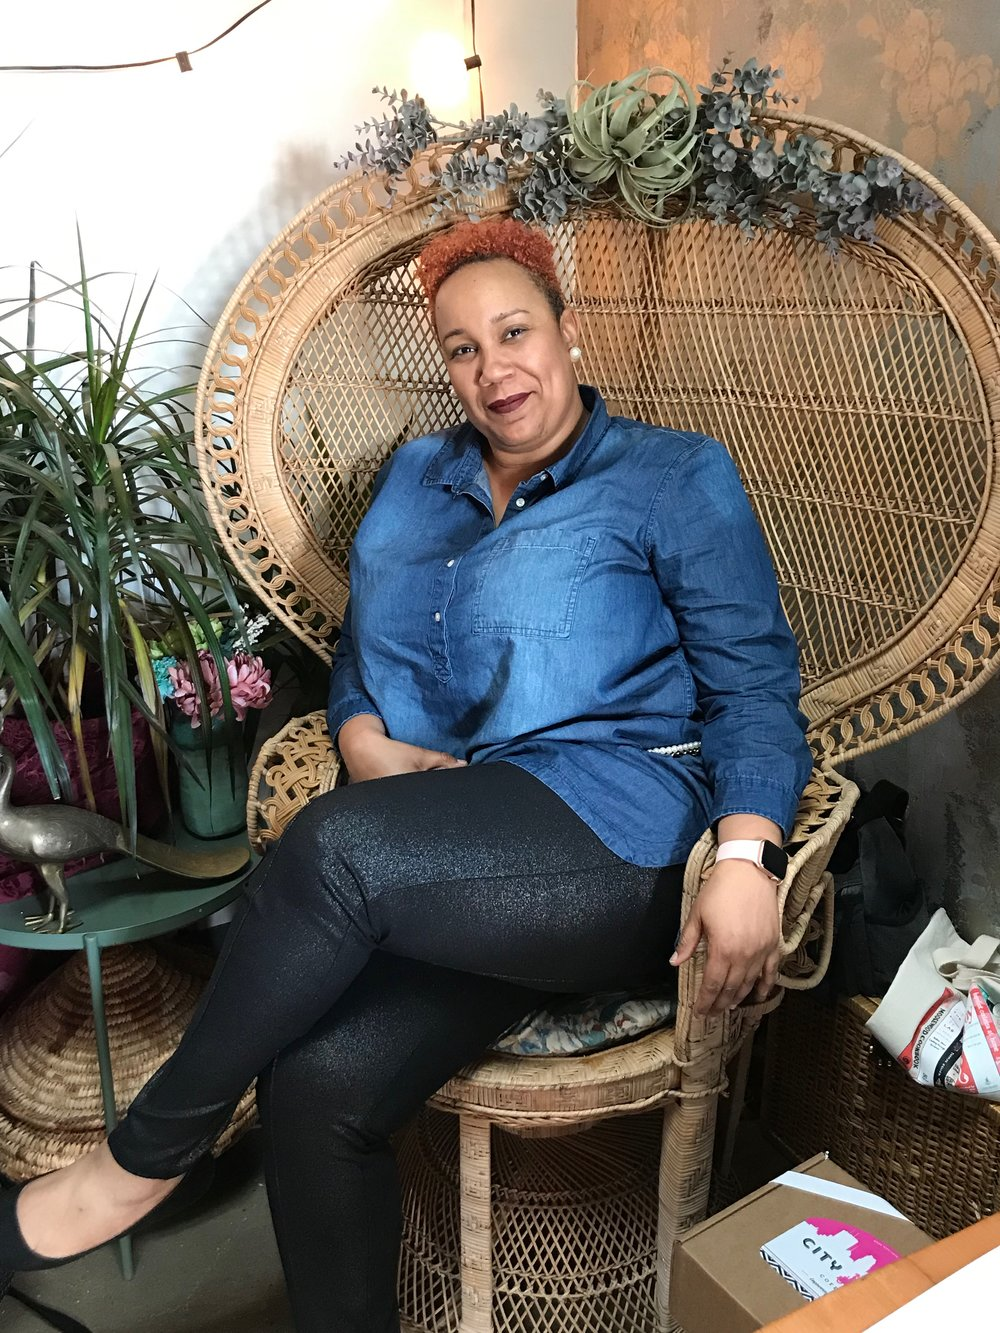 Founder of SheChef Elle Simone